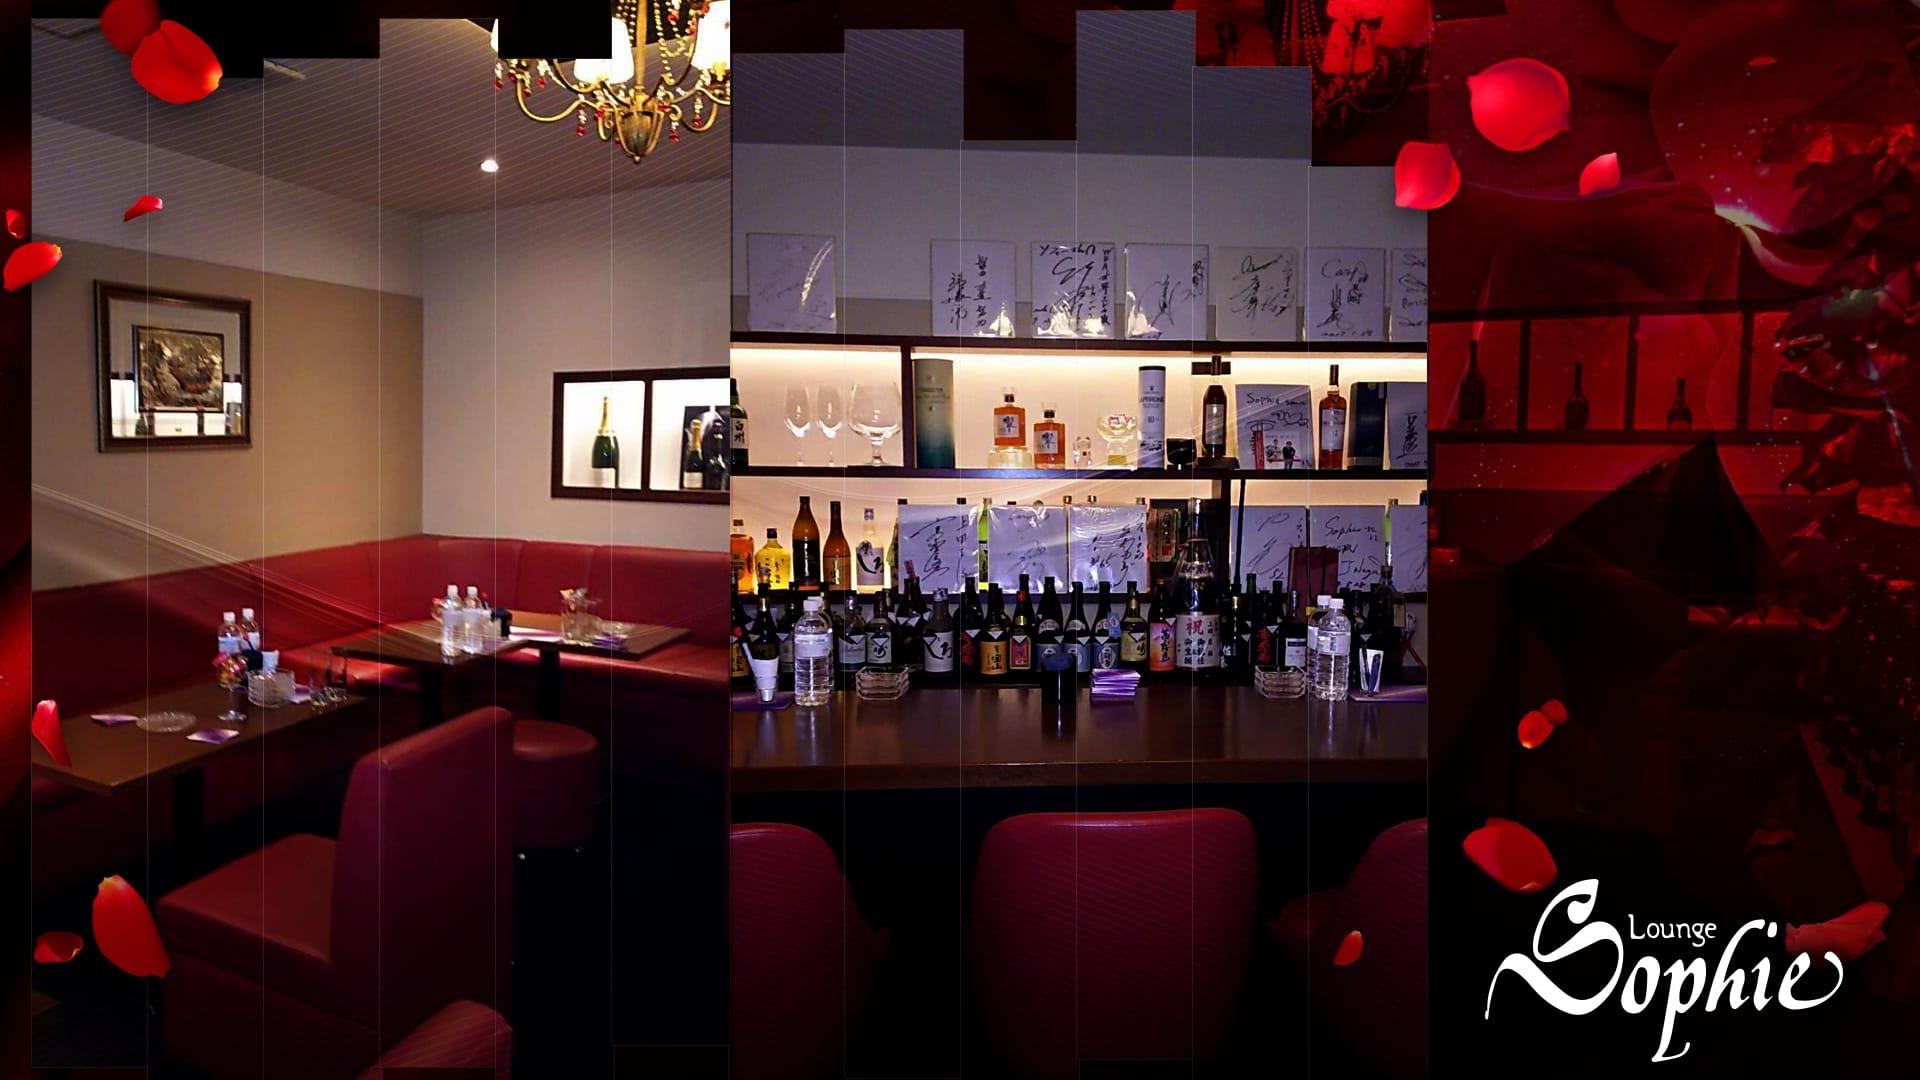 Lounge Sophie【ラウンジソフィー】 TOP画像